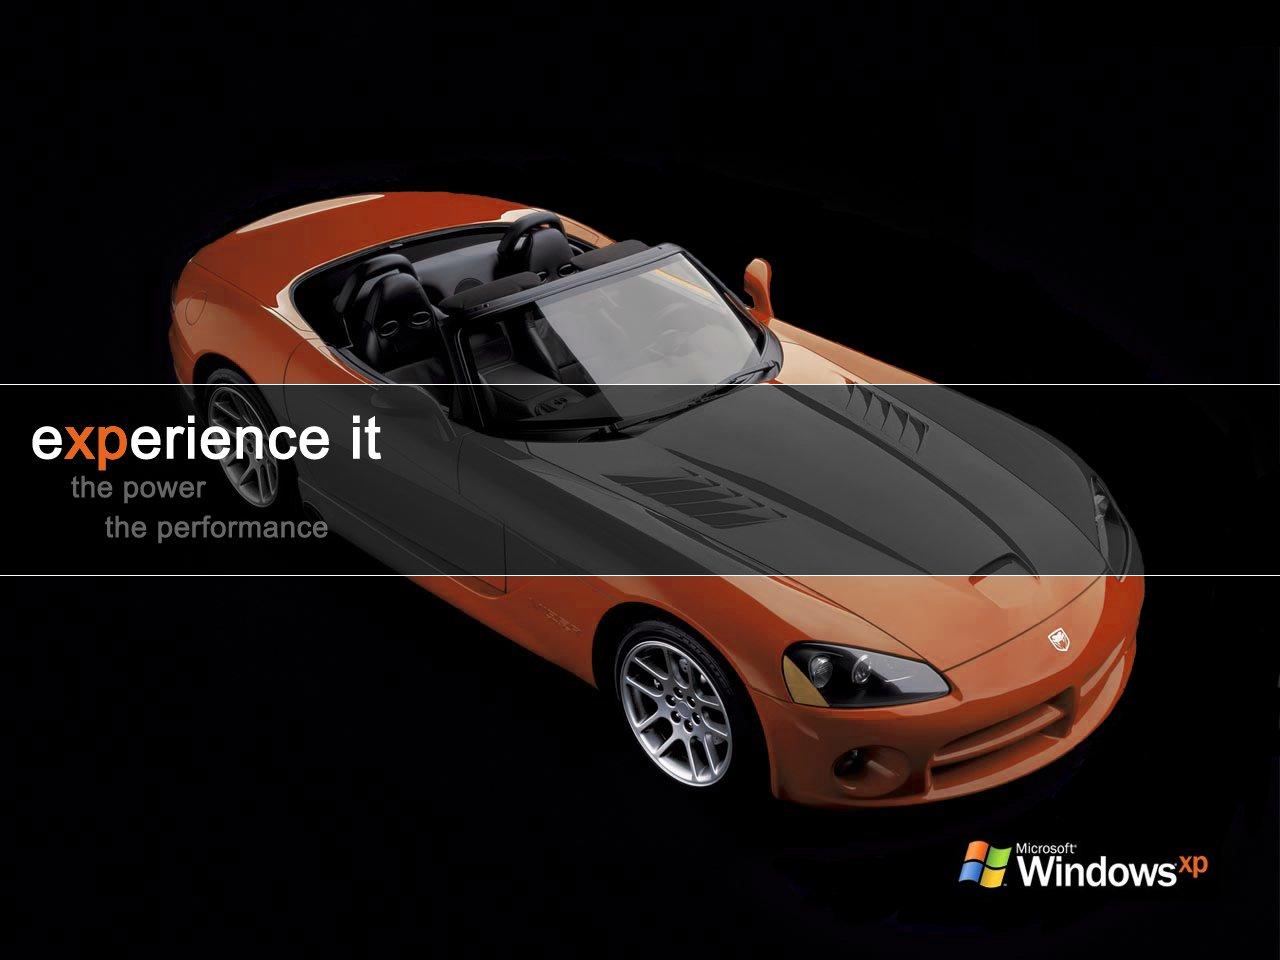 Wallpaper Theme Windows XP voiture